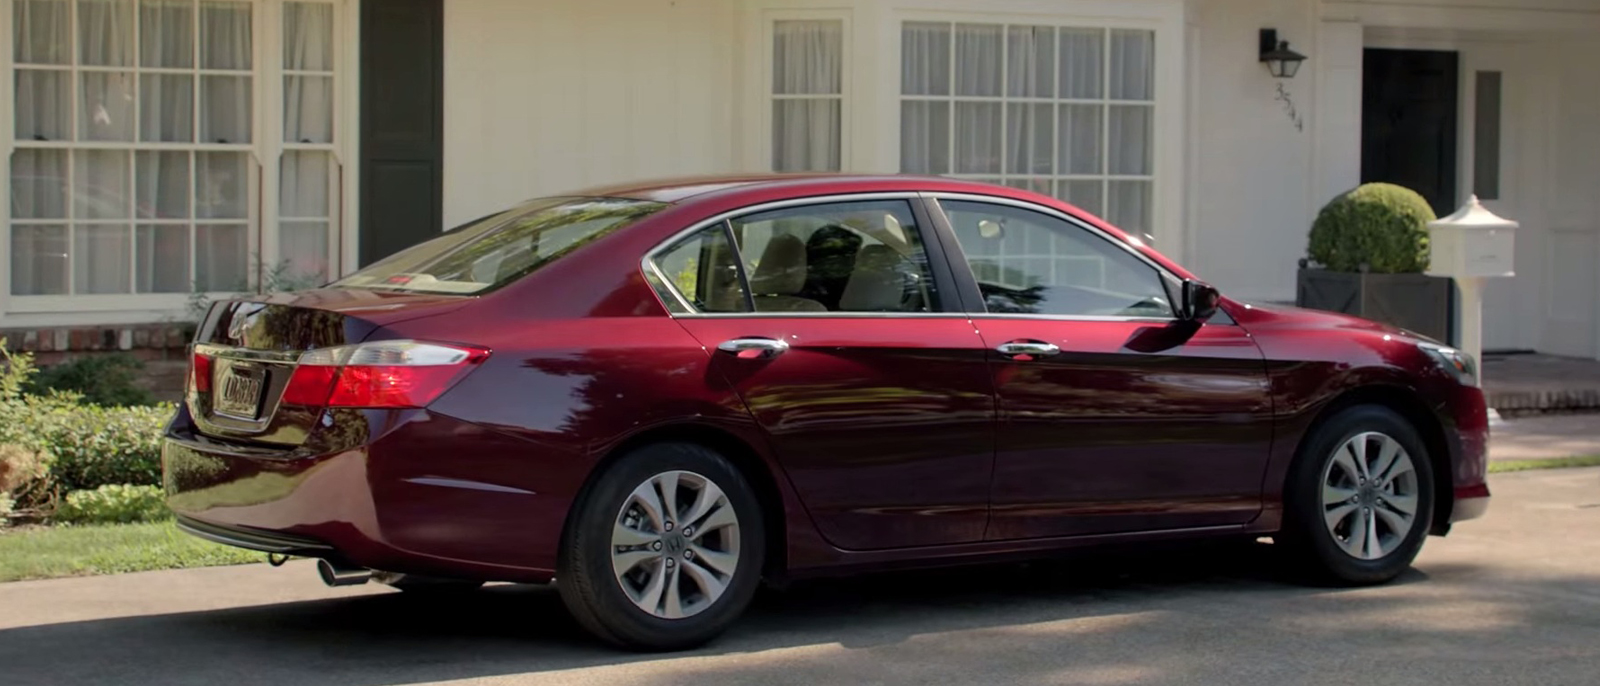 2015 Honda Accord Exterior Side Rear